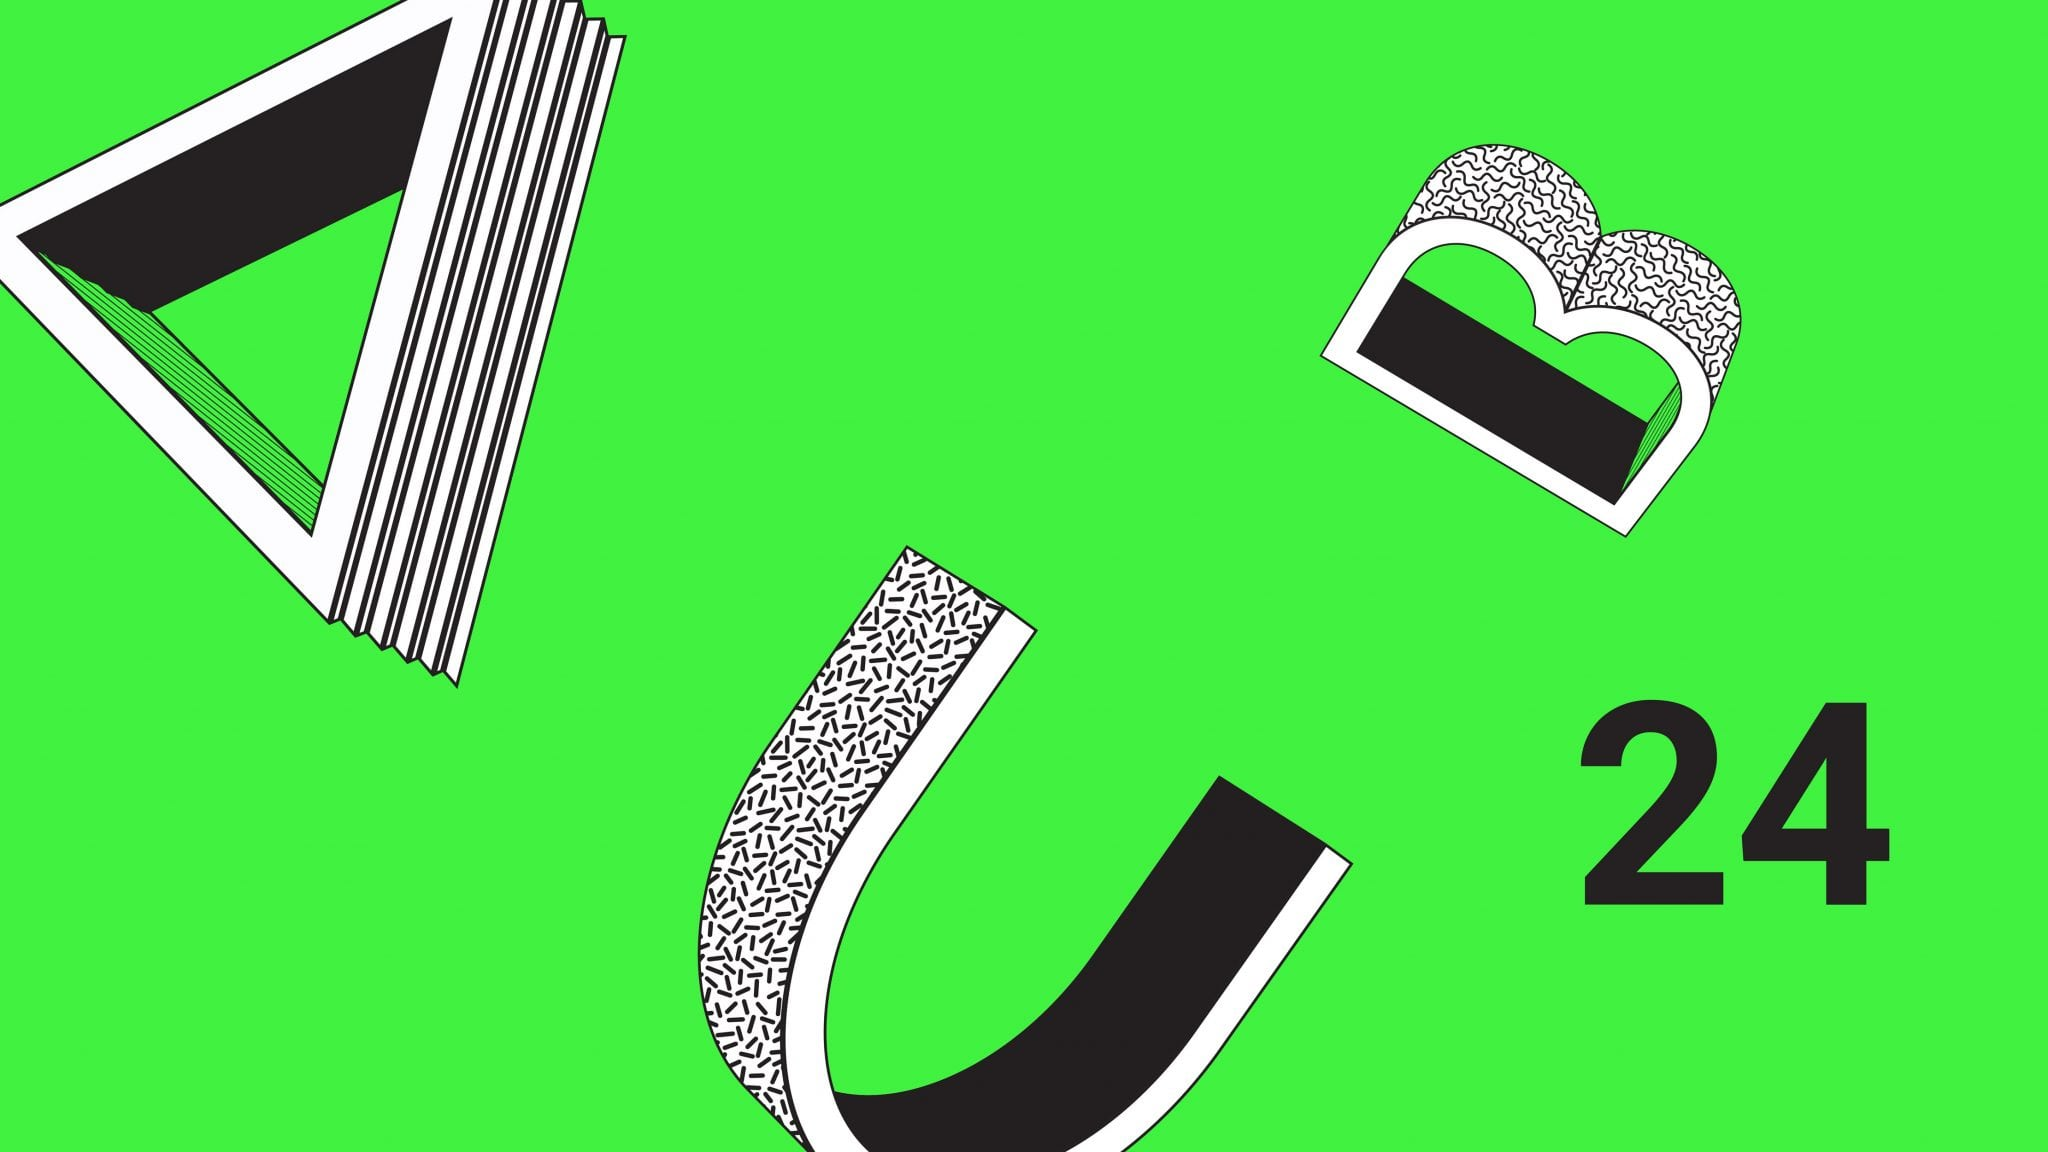 AUB 24 + Virgin StartUp